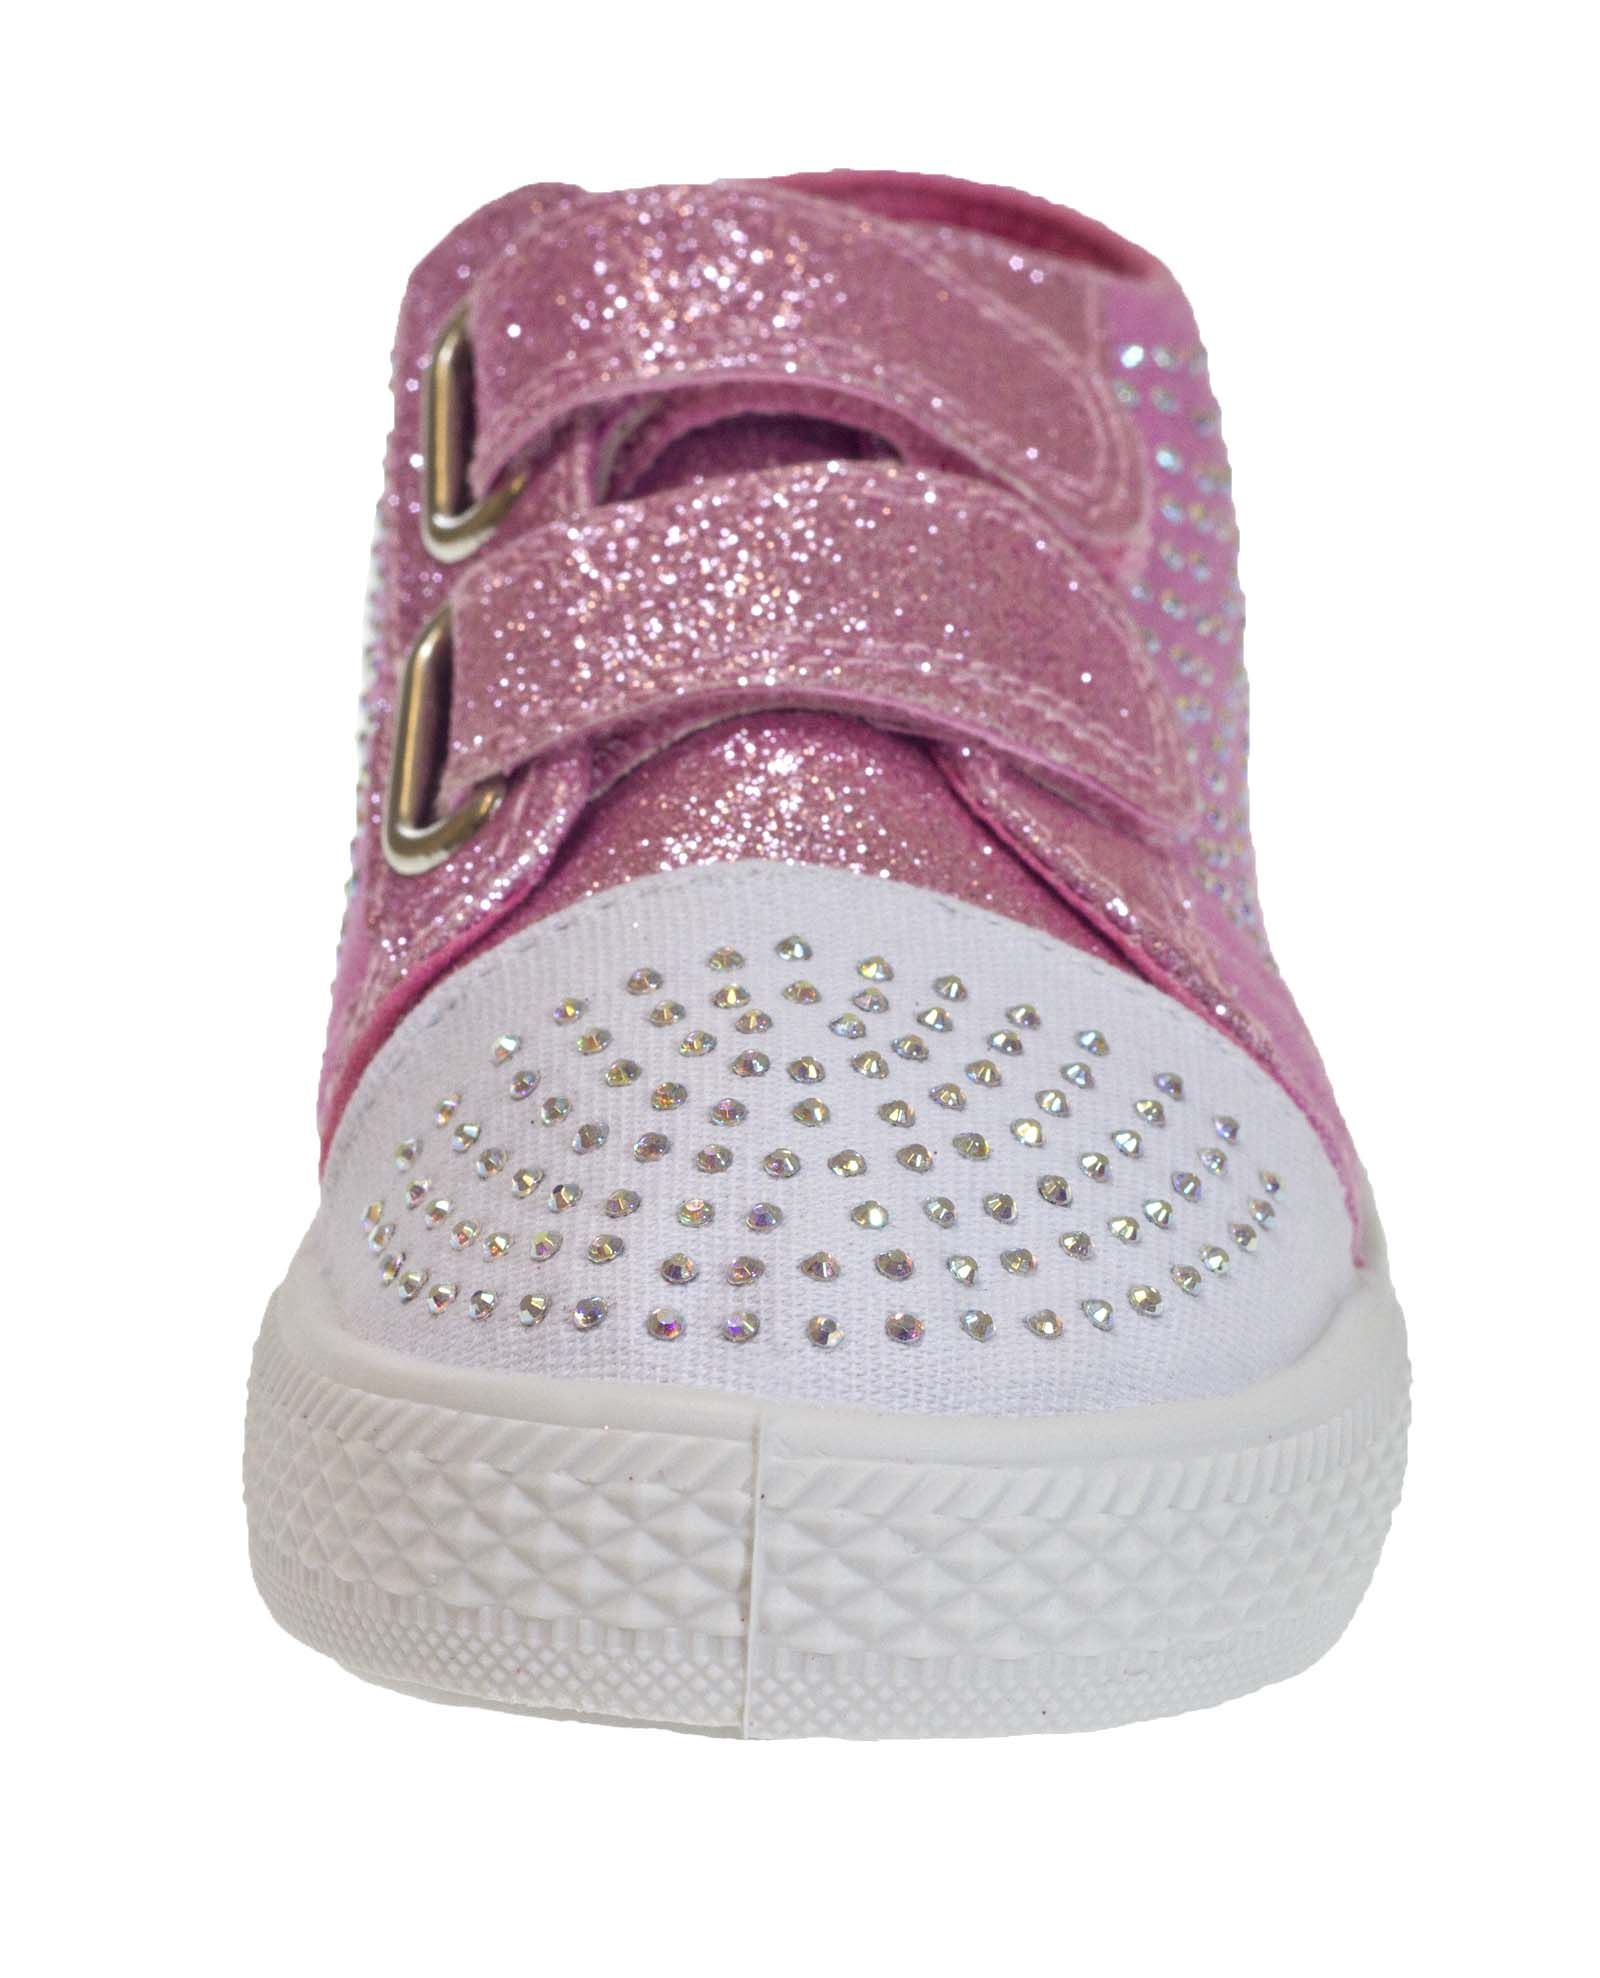 Niños CHICAS Brillo Velcro Bombas Lentejuelas Zapatos Canvas Bombas formadores tamaño del Reino Unido 7-2